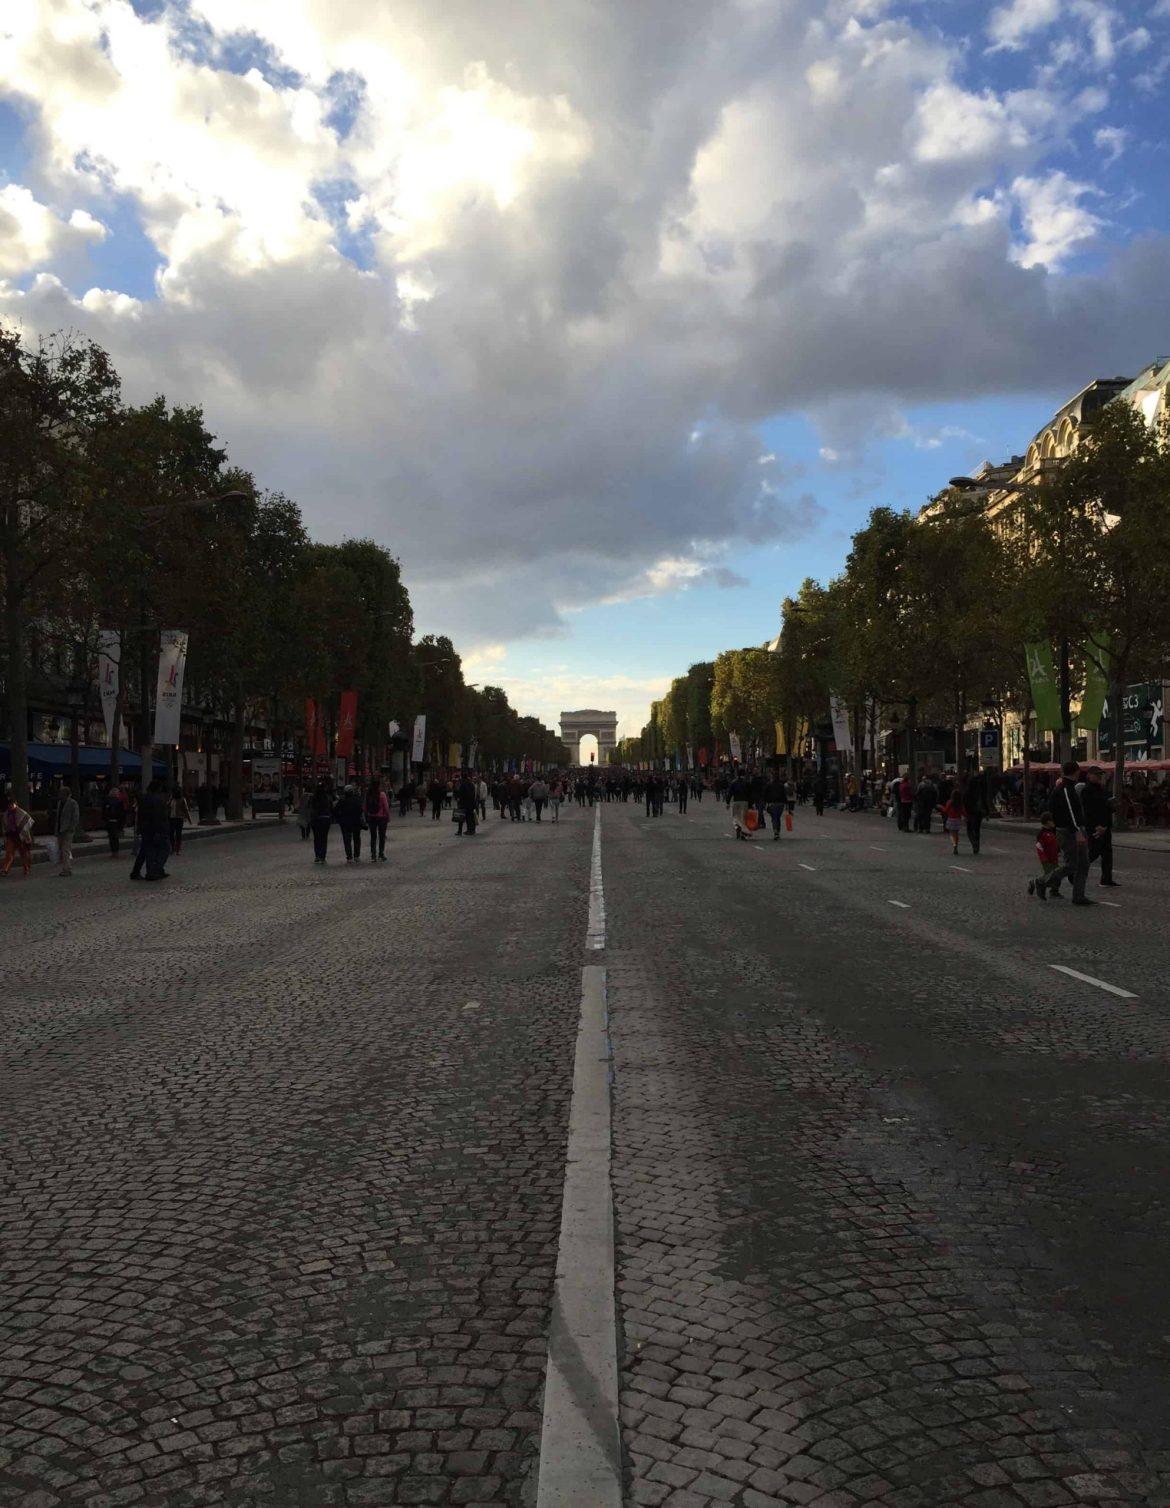 Der Triumphbogen in Paris von Champs Elysées